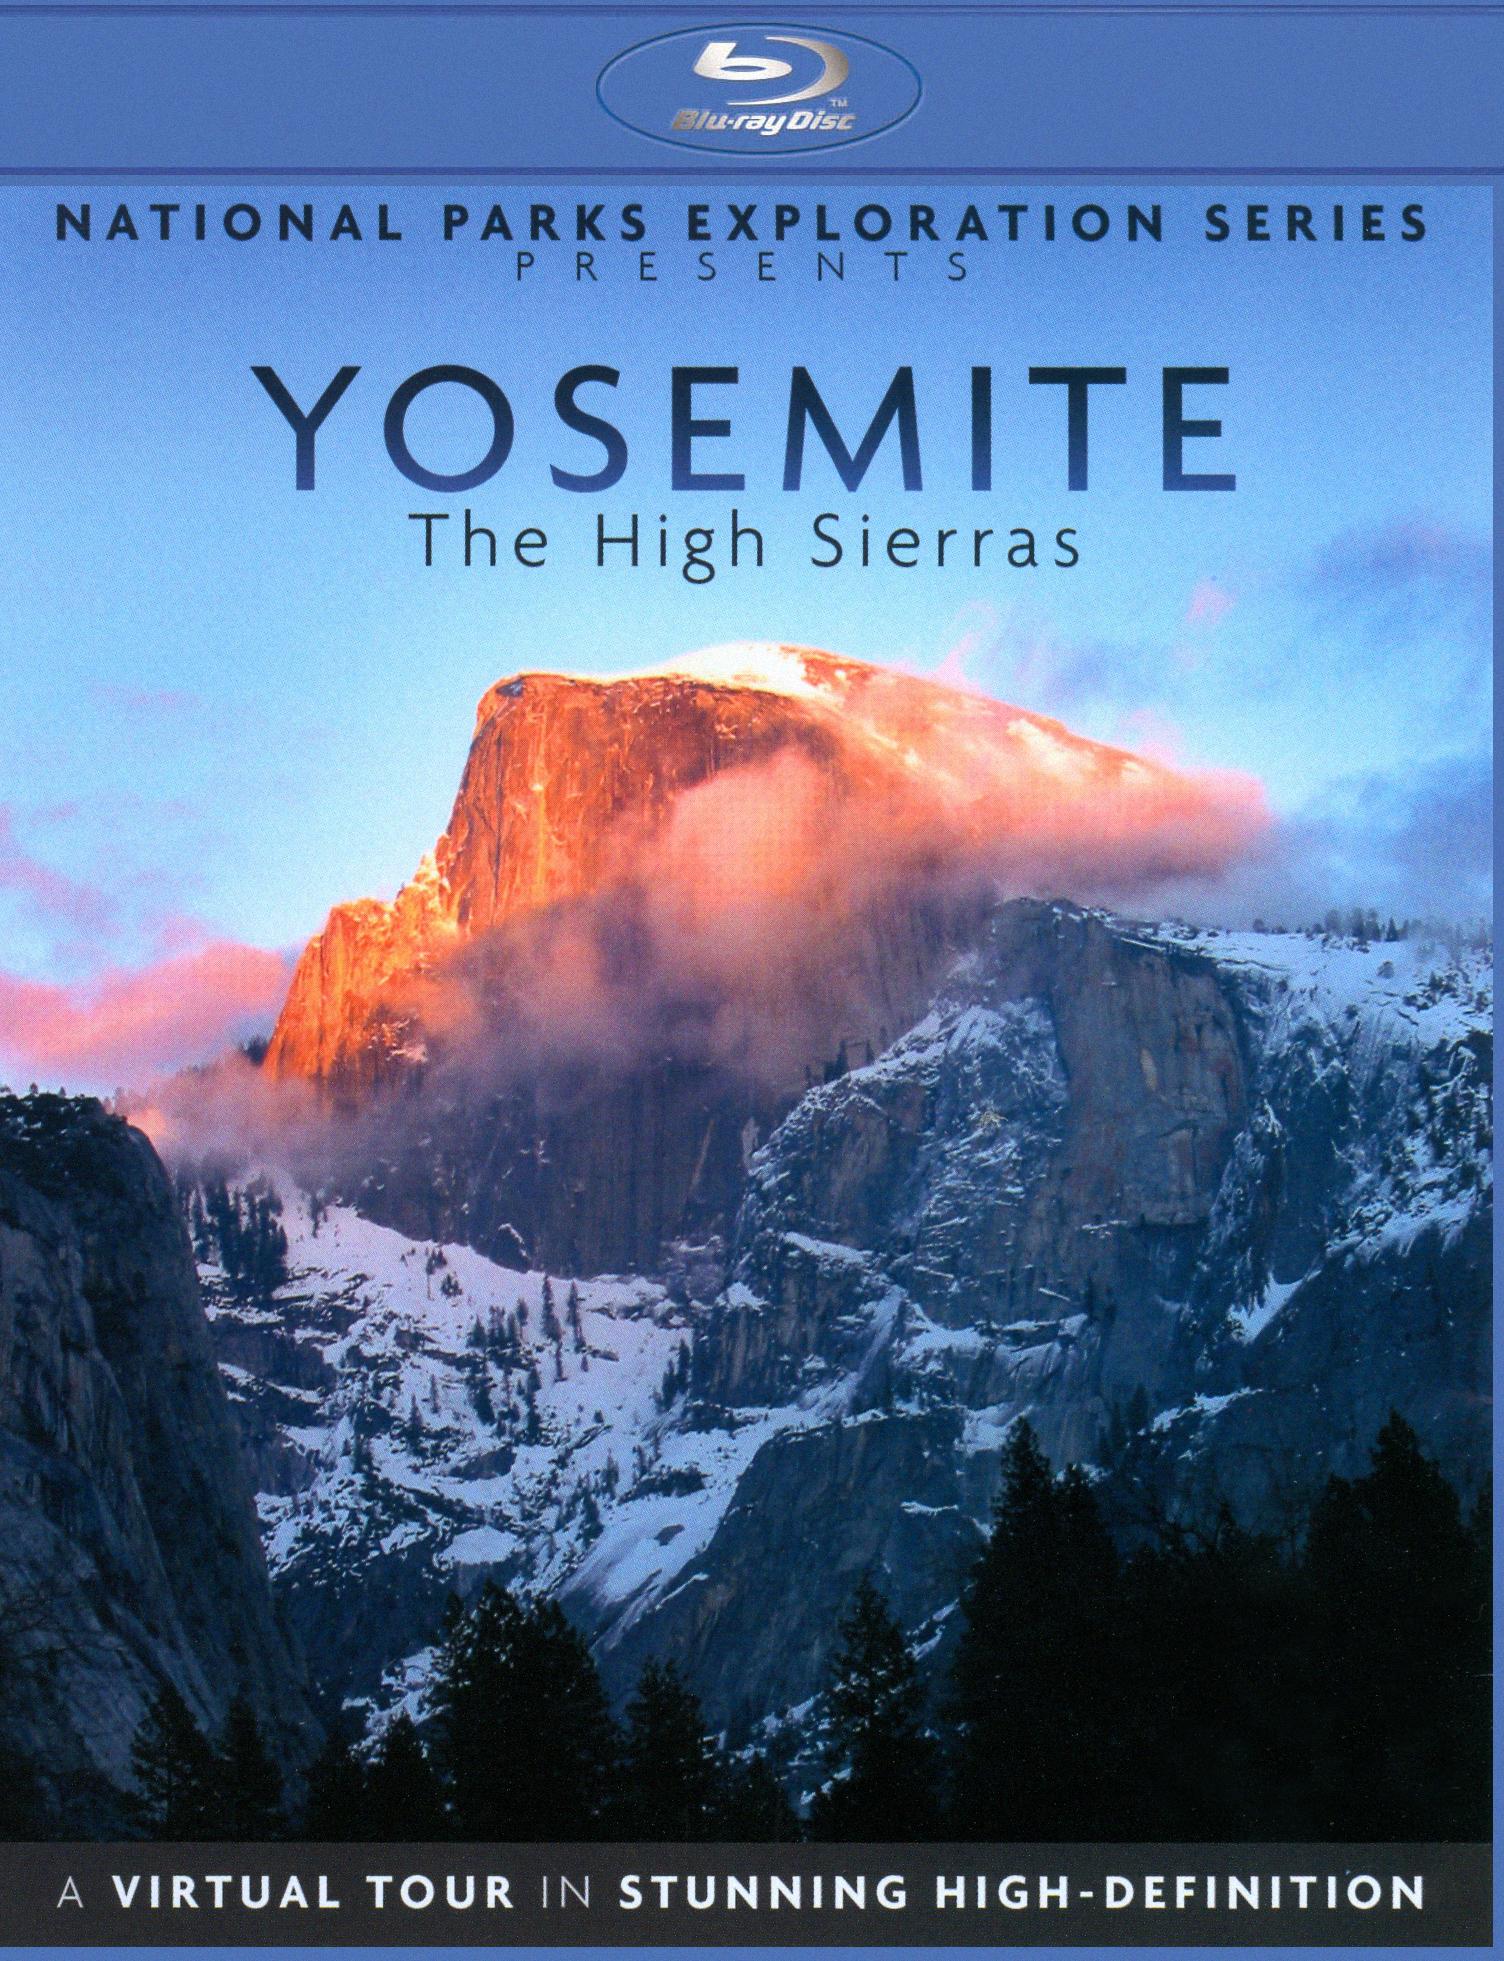 Yosemite: The High Sierras